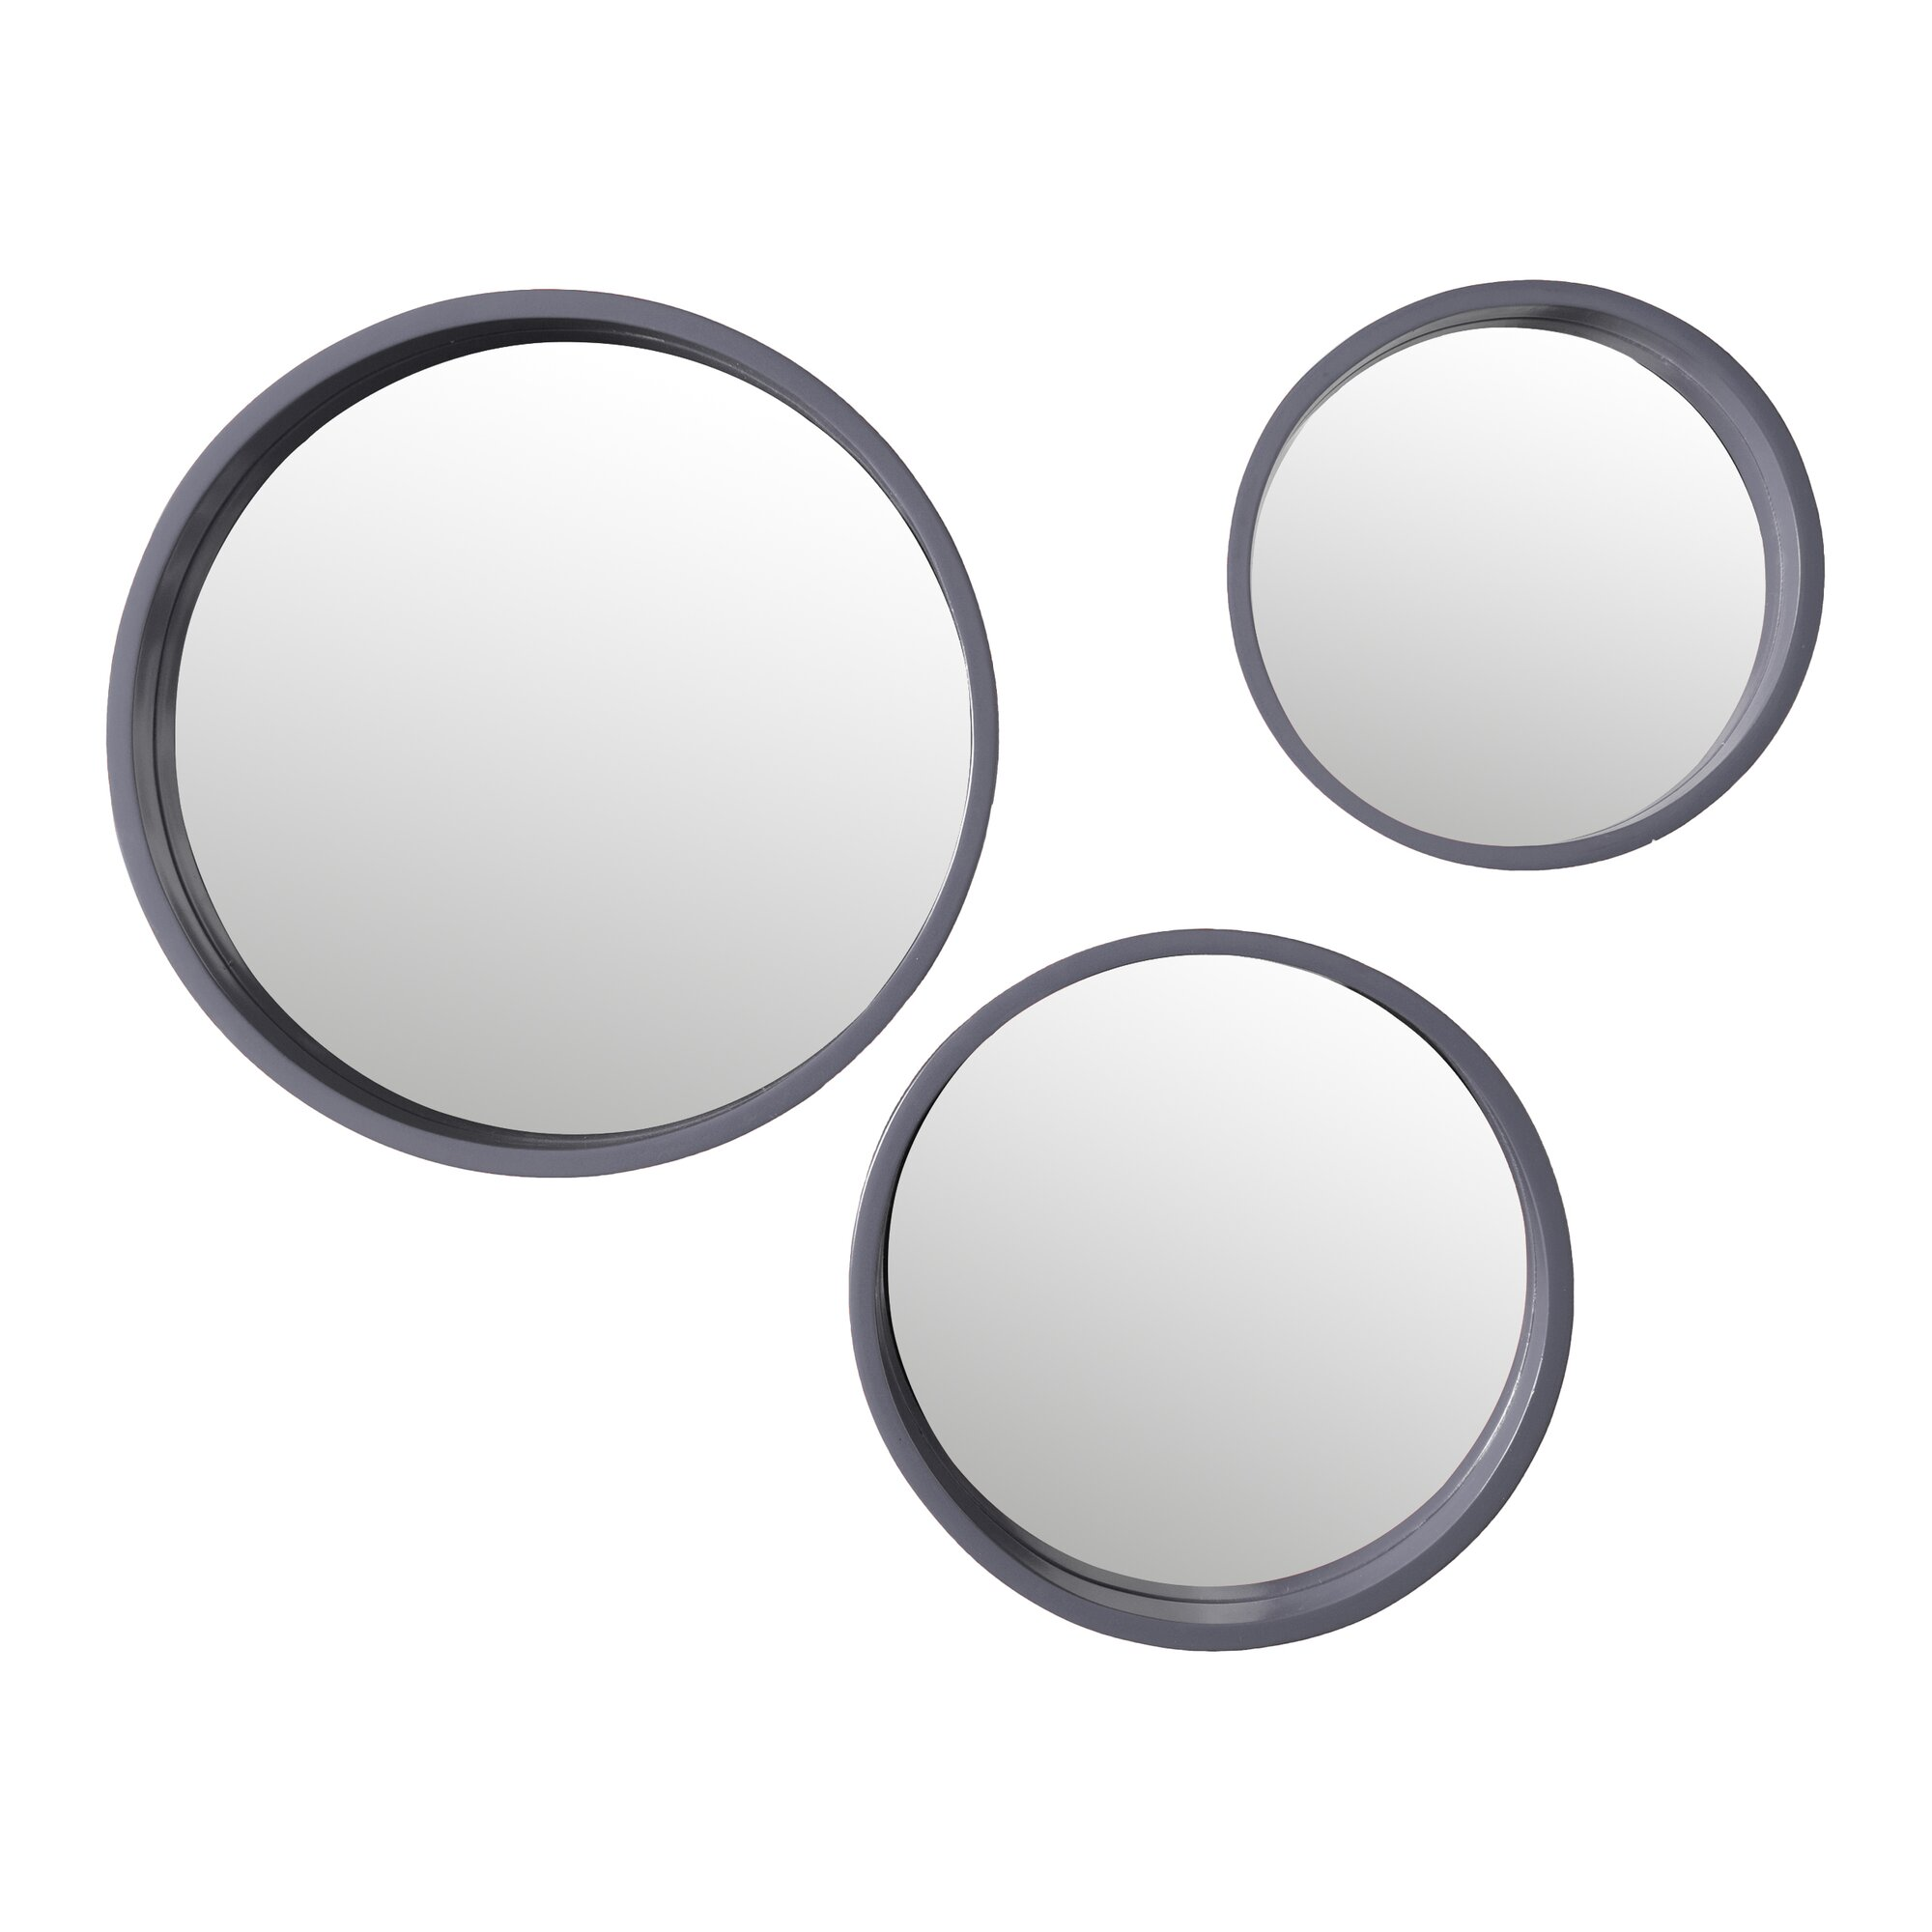 Three Posts 3 Piece Round Wall Mirror Set amp Reviews  : 3PieceRoundWallMirrorSet from www.wayfair.ca size 2000 x 2000 jpeg 117kB